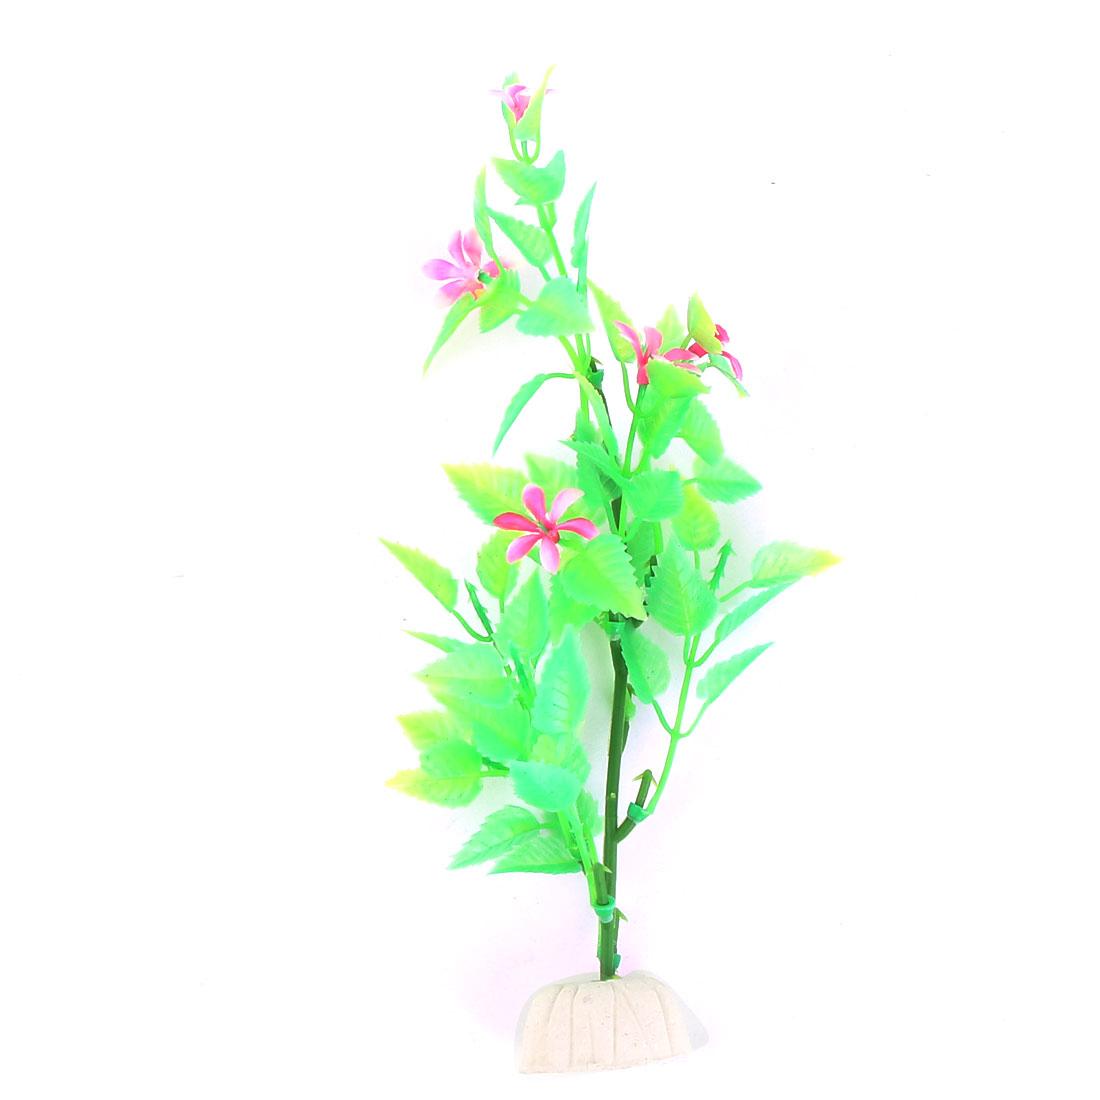 Plastic Fish Tank Emulational Water Plants Flower Decoration Green Pink